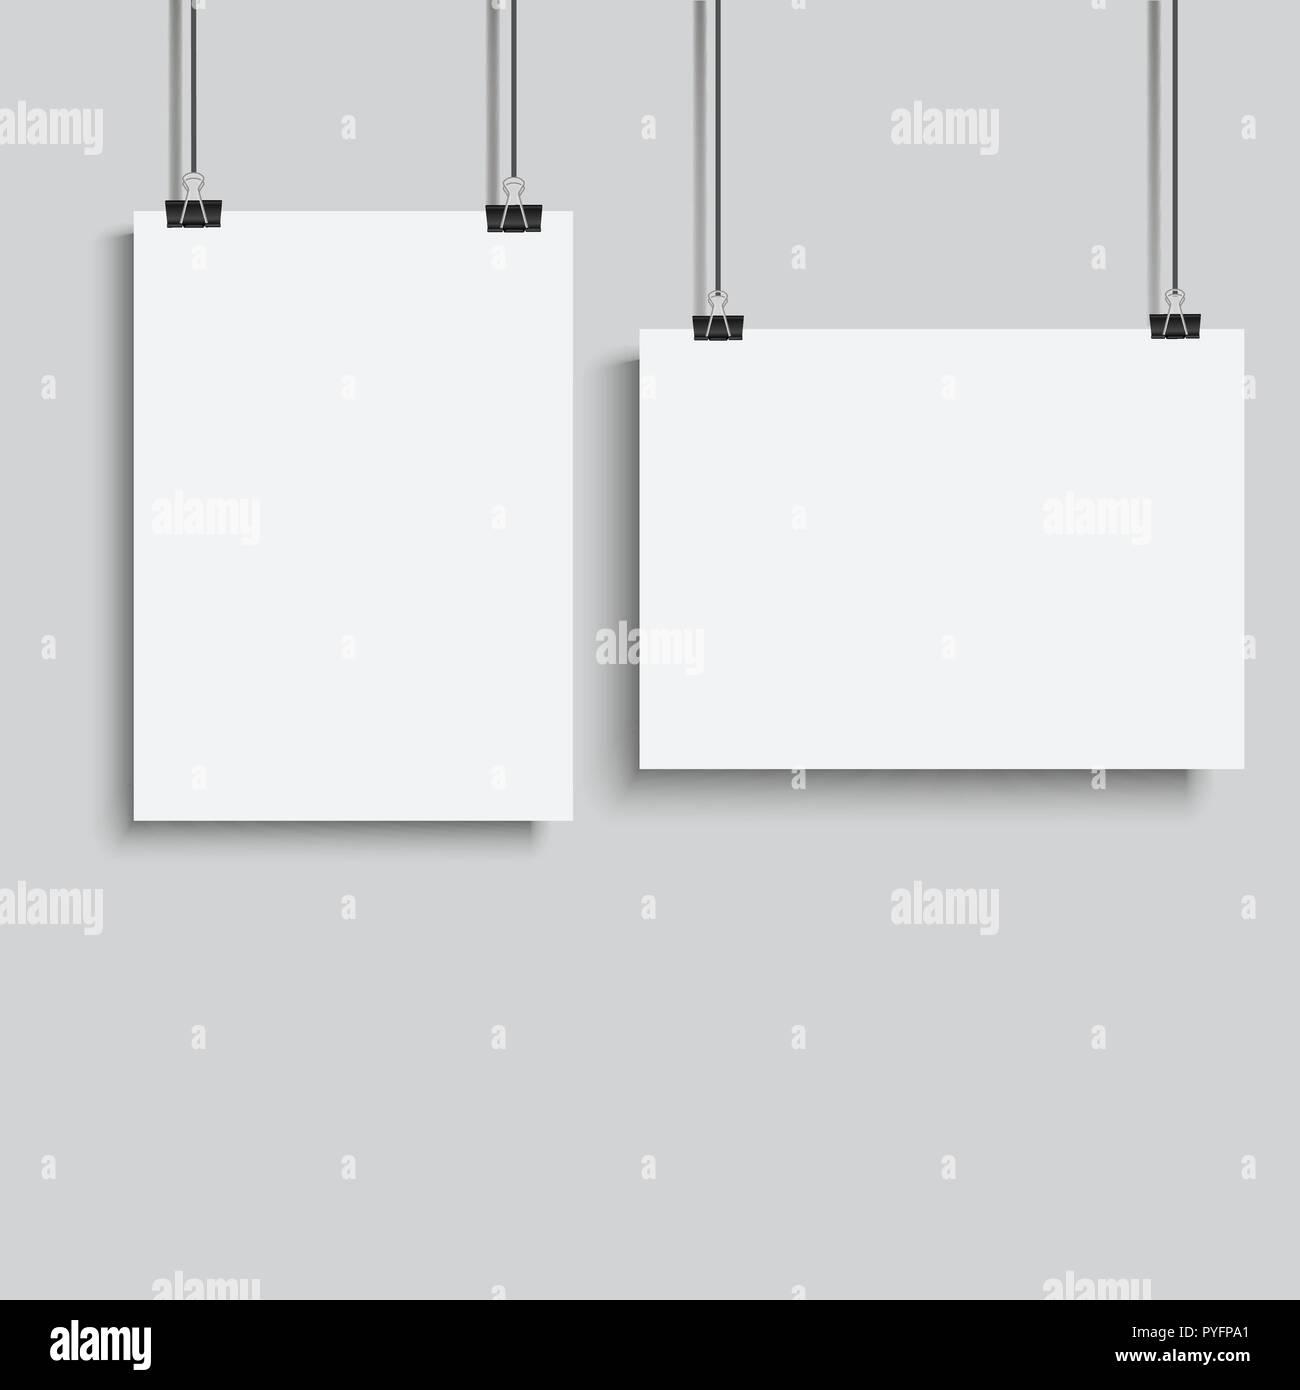 Weiß Poster aufhängen an Binder. Vector Illustration. Stockbild